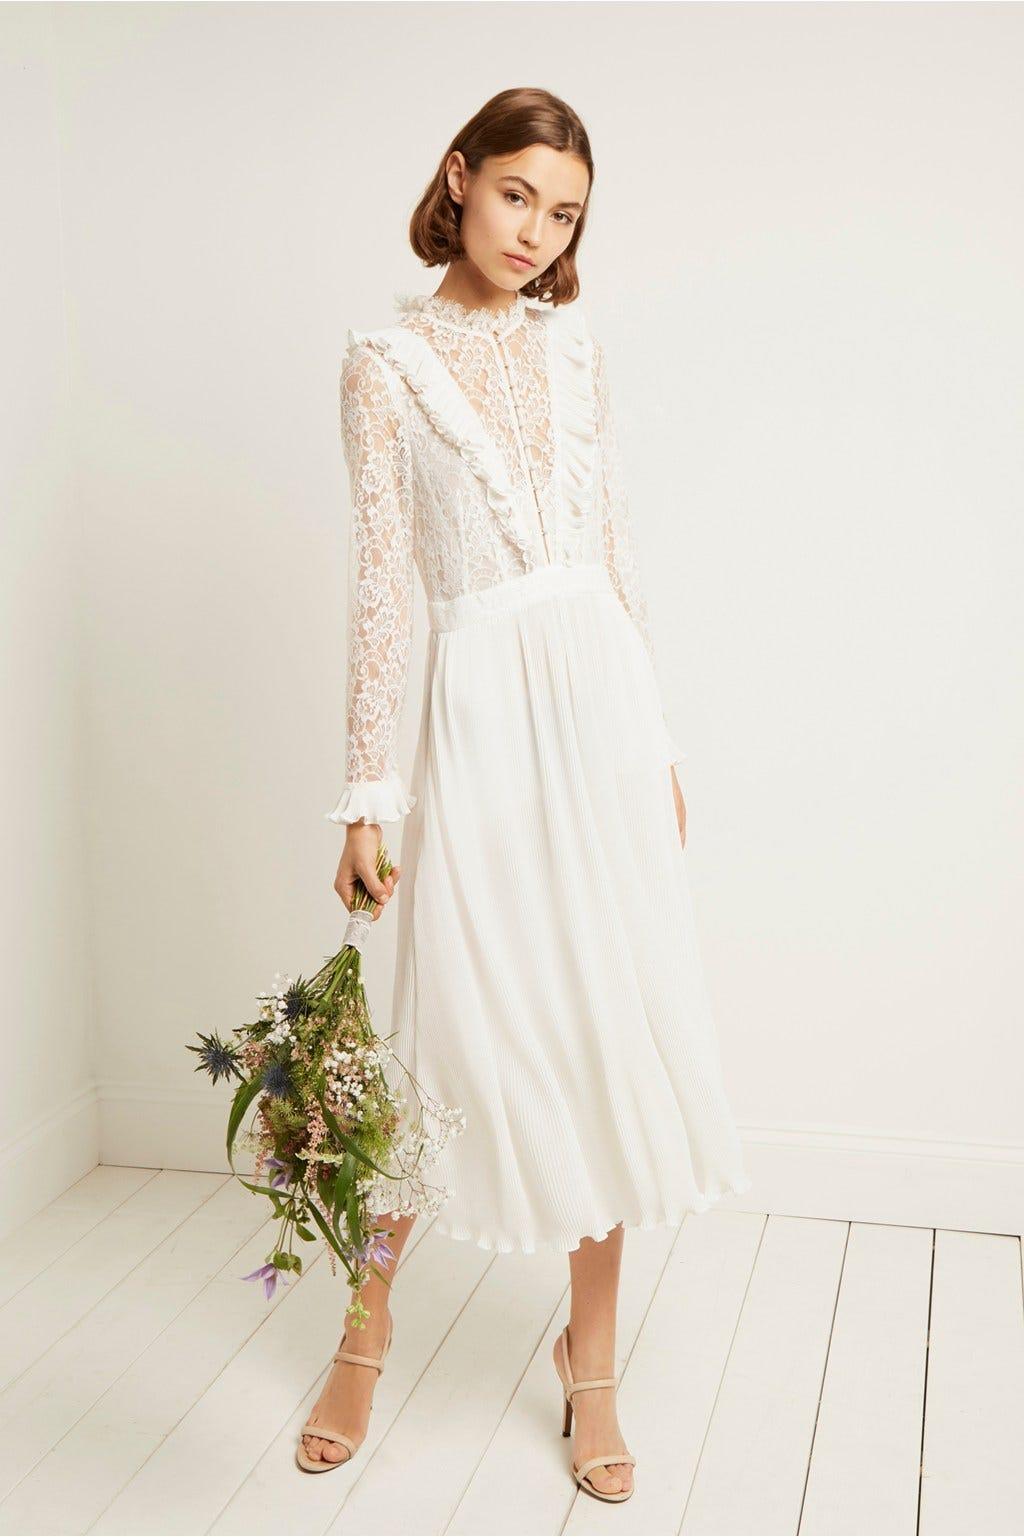 67137b3f51dc4 Non Traditional, Alternative Wedding Dresses